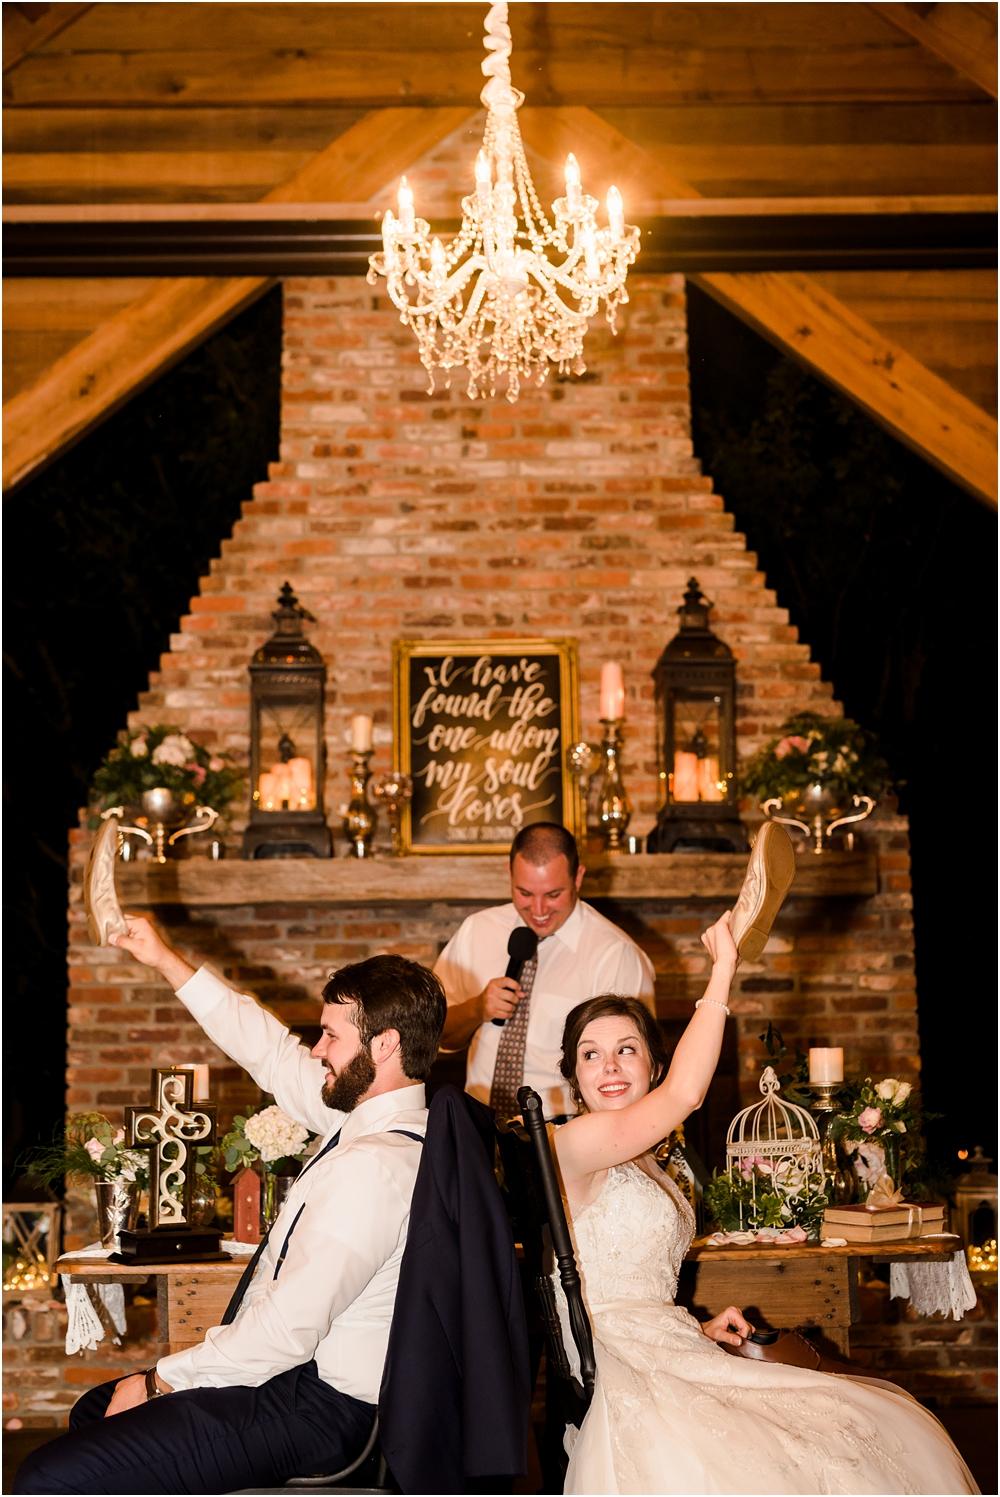 marianna-florida-wedding-photographer-kiersten-grant-204.jpg